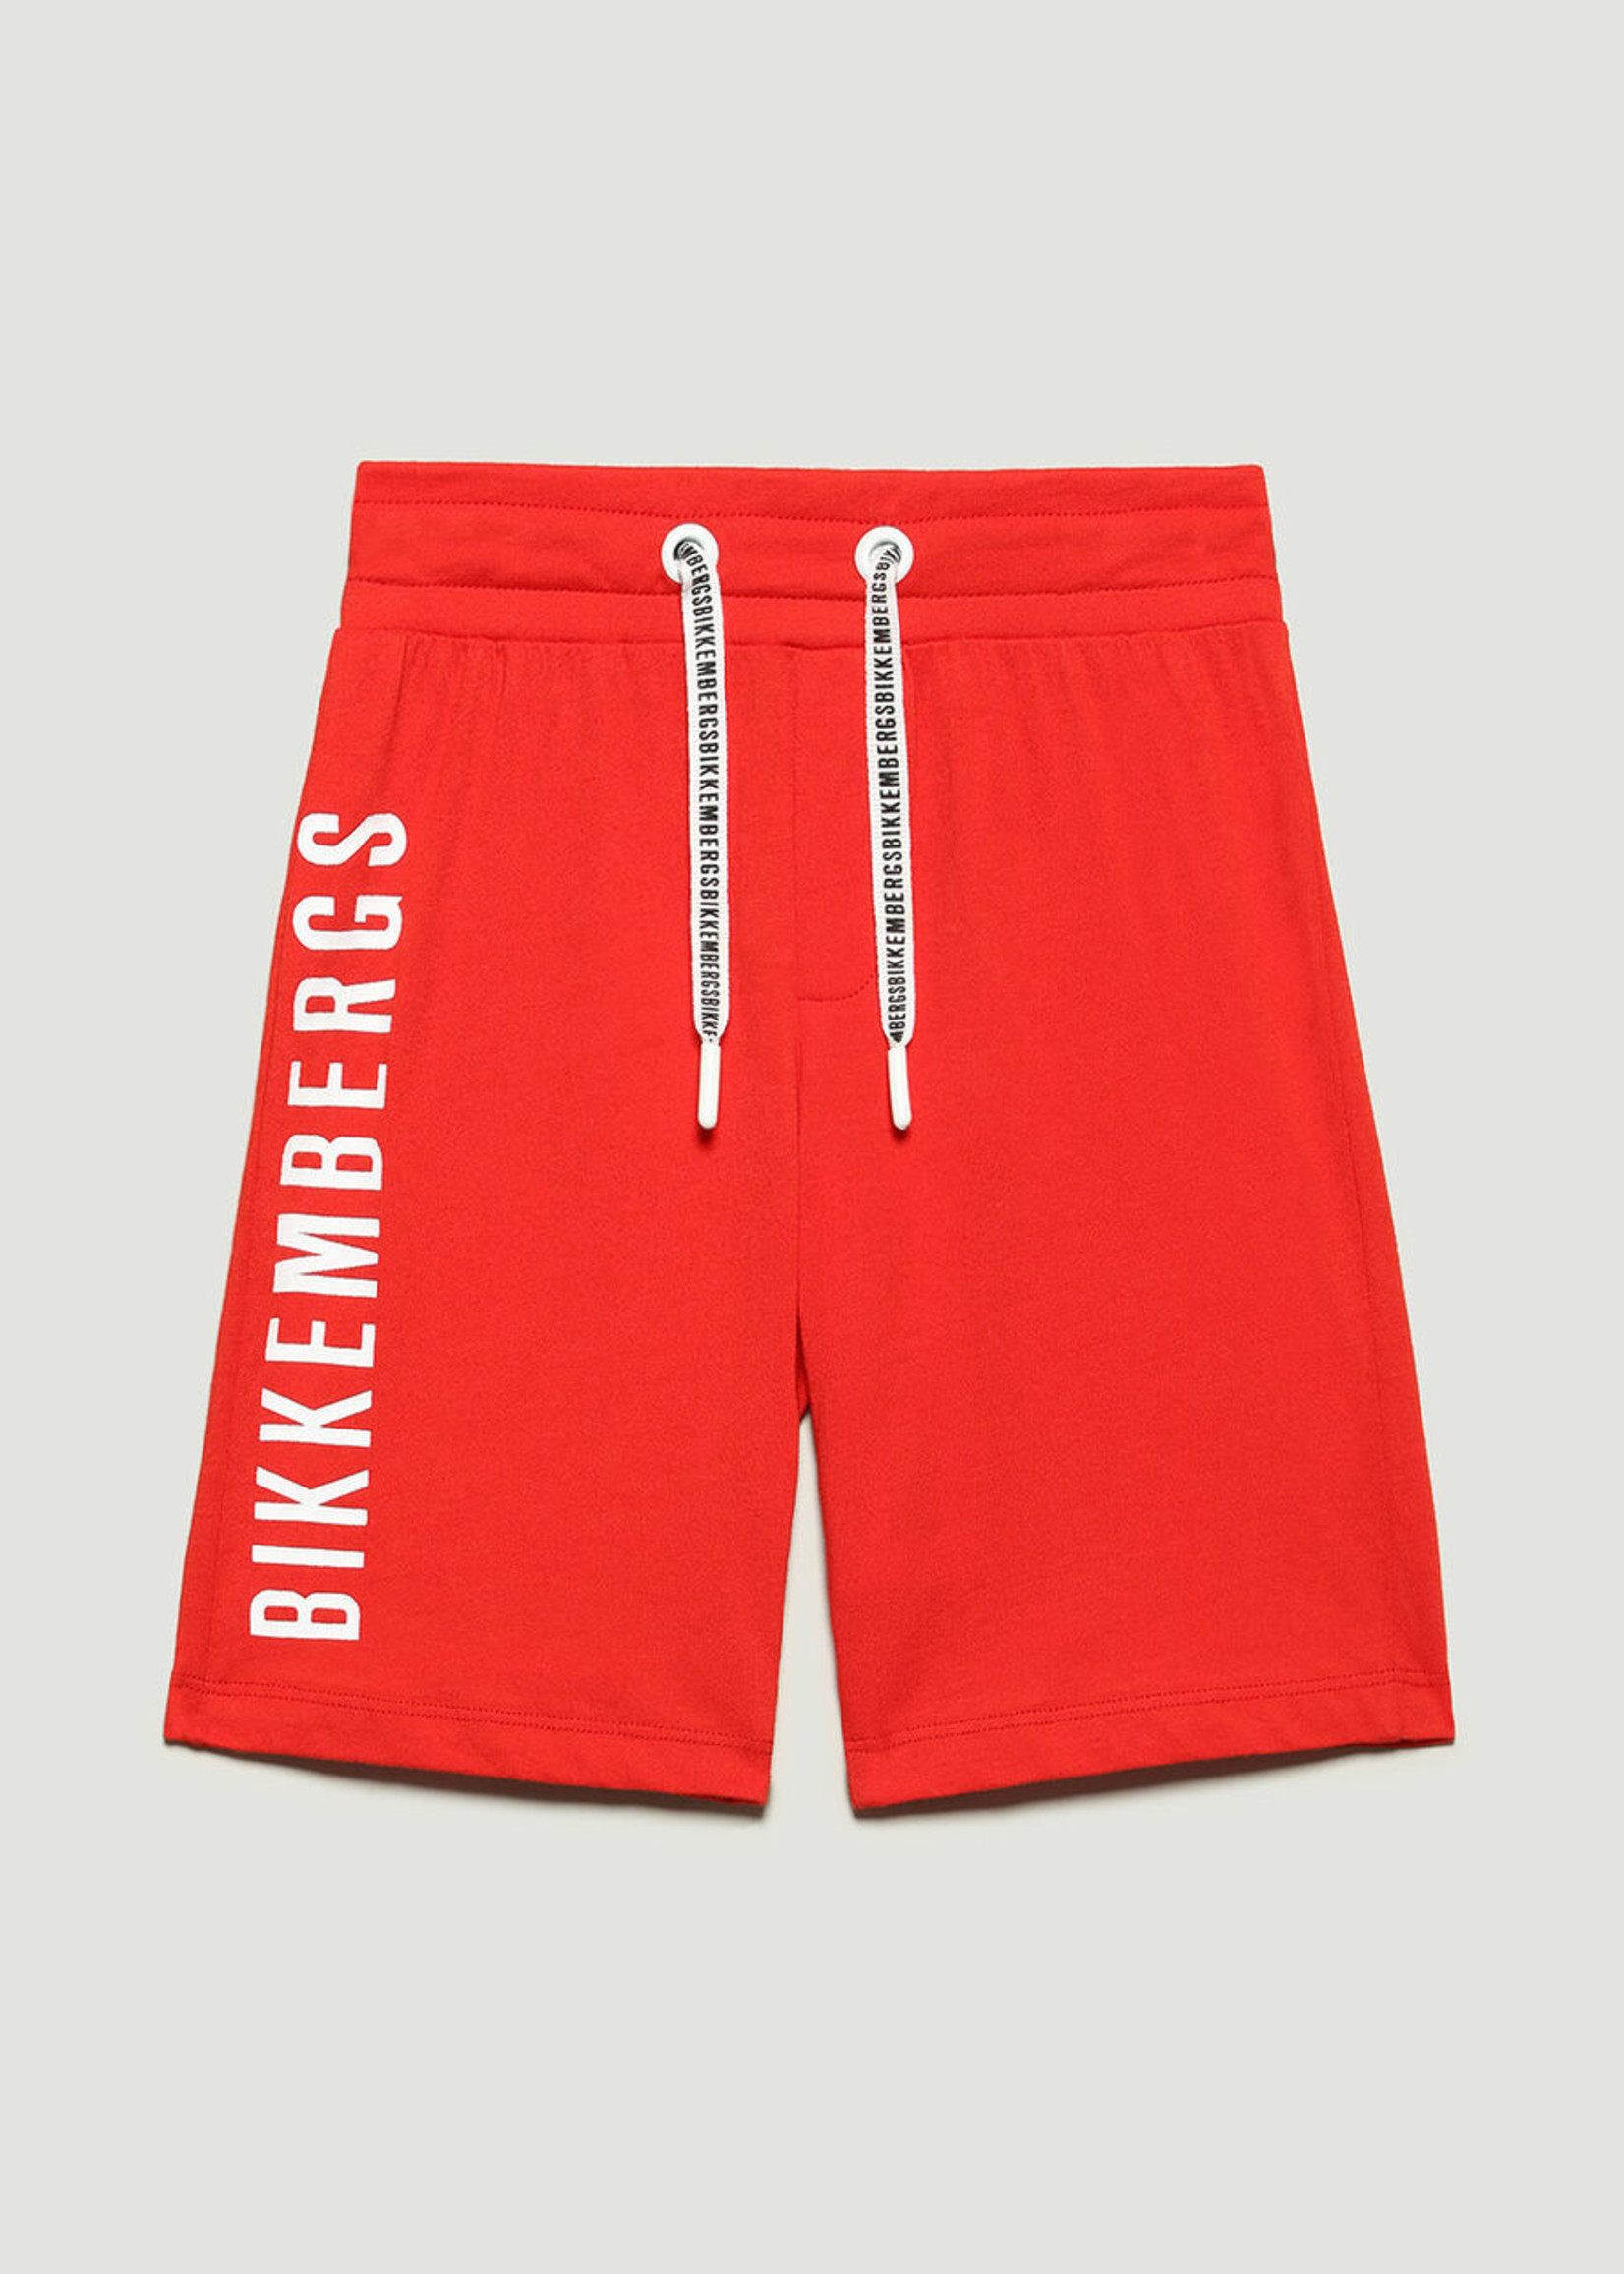 Bikkembergs Bikkembergs 2pc set red